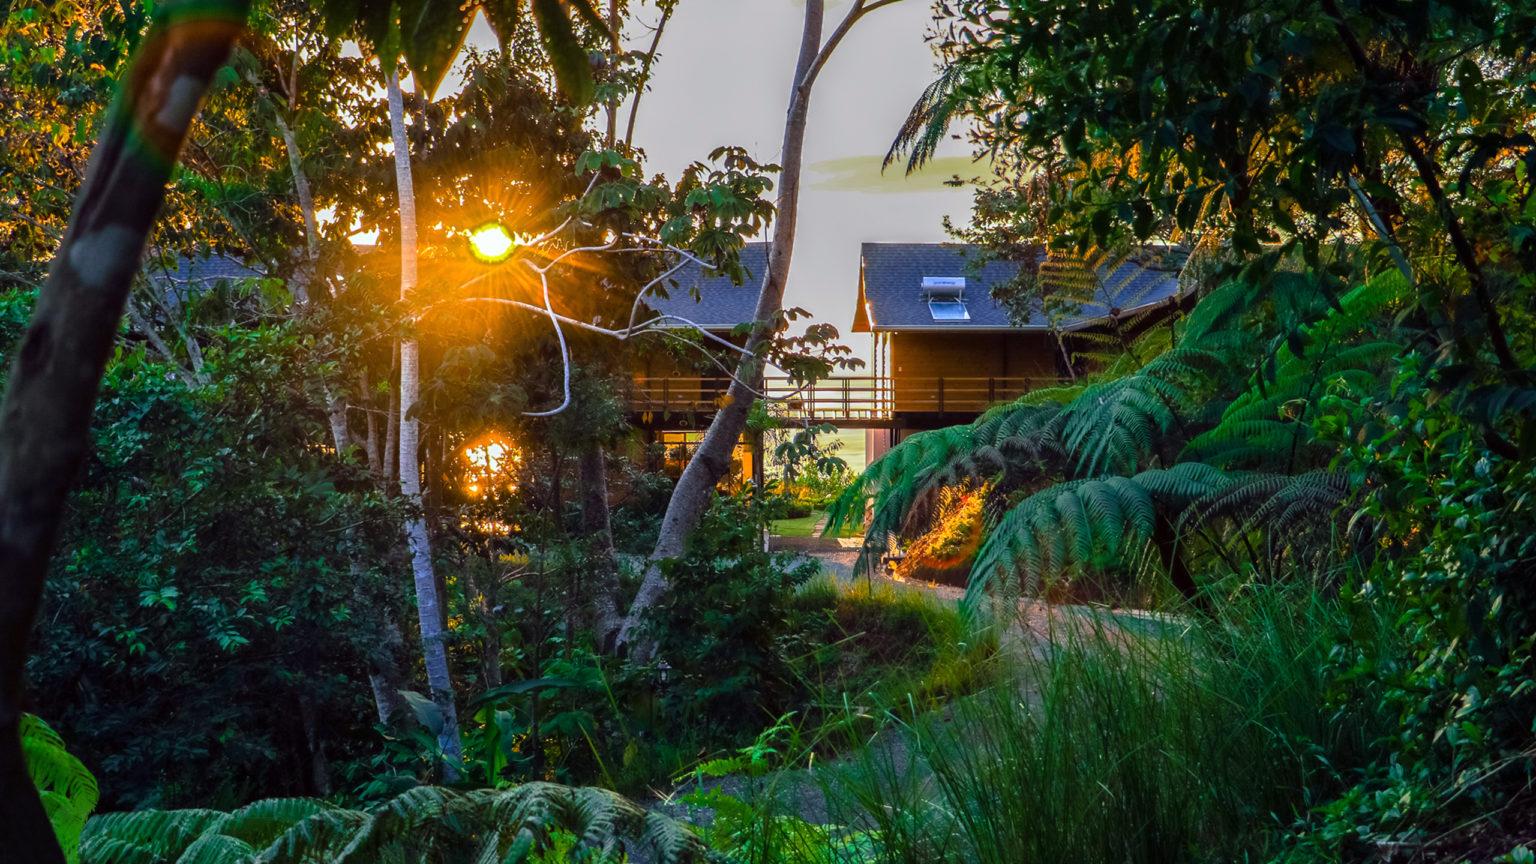 Kalon Surf Luxury Resort Costa Rica in Osa Peninsula Jungle